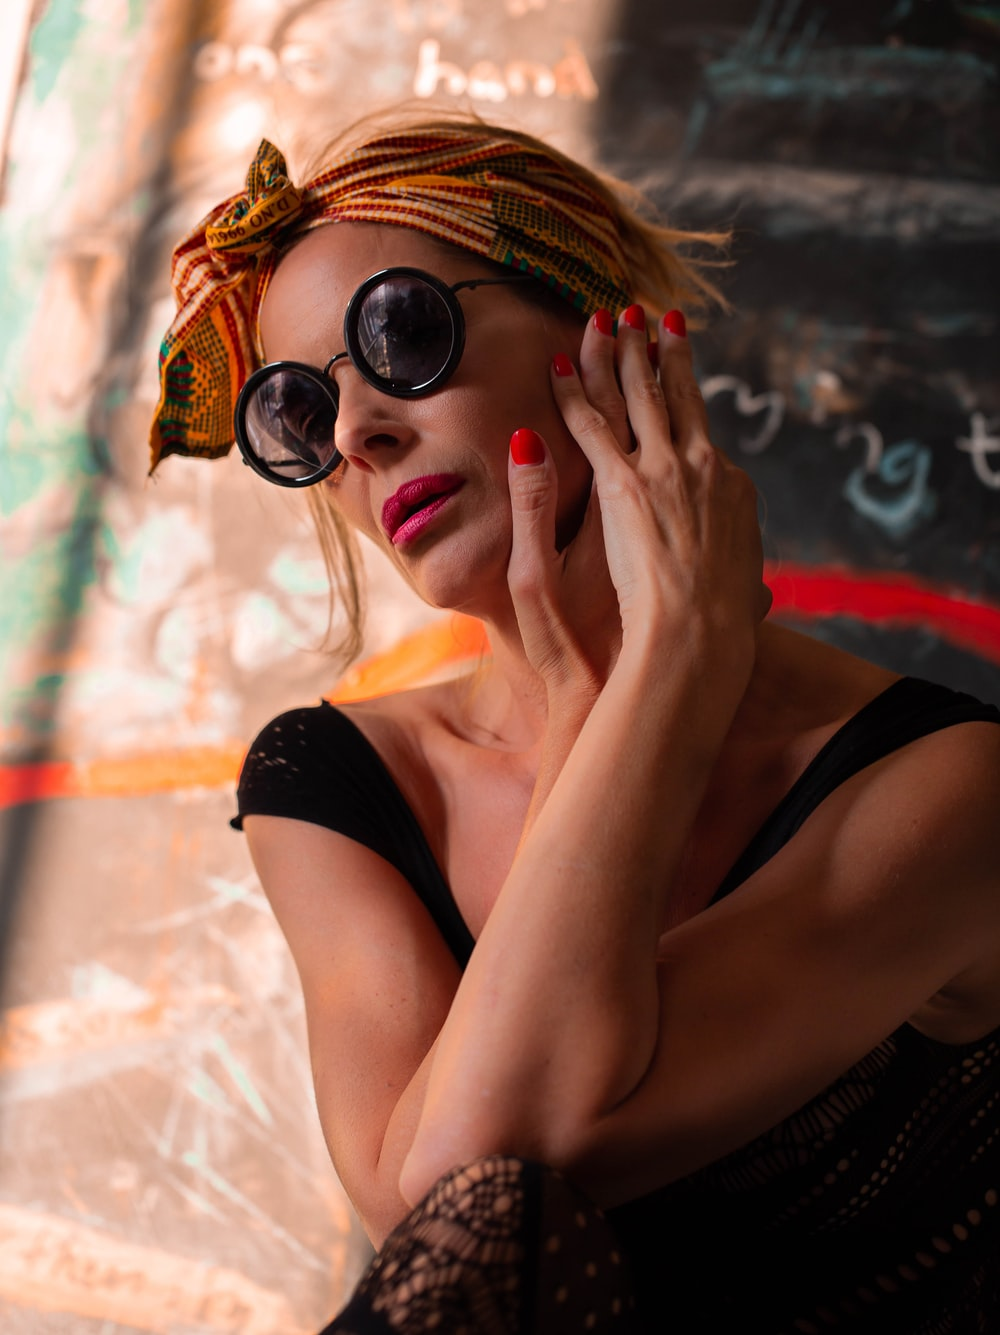 woman in black tank top wearing sunglasses